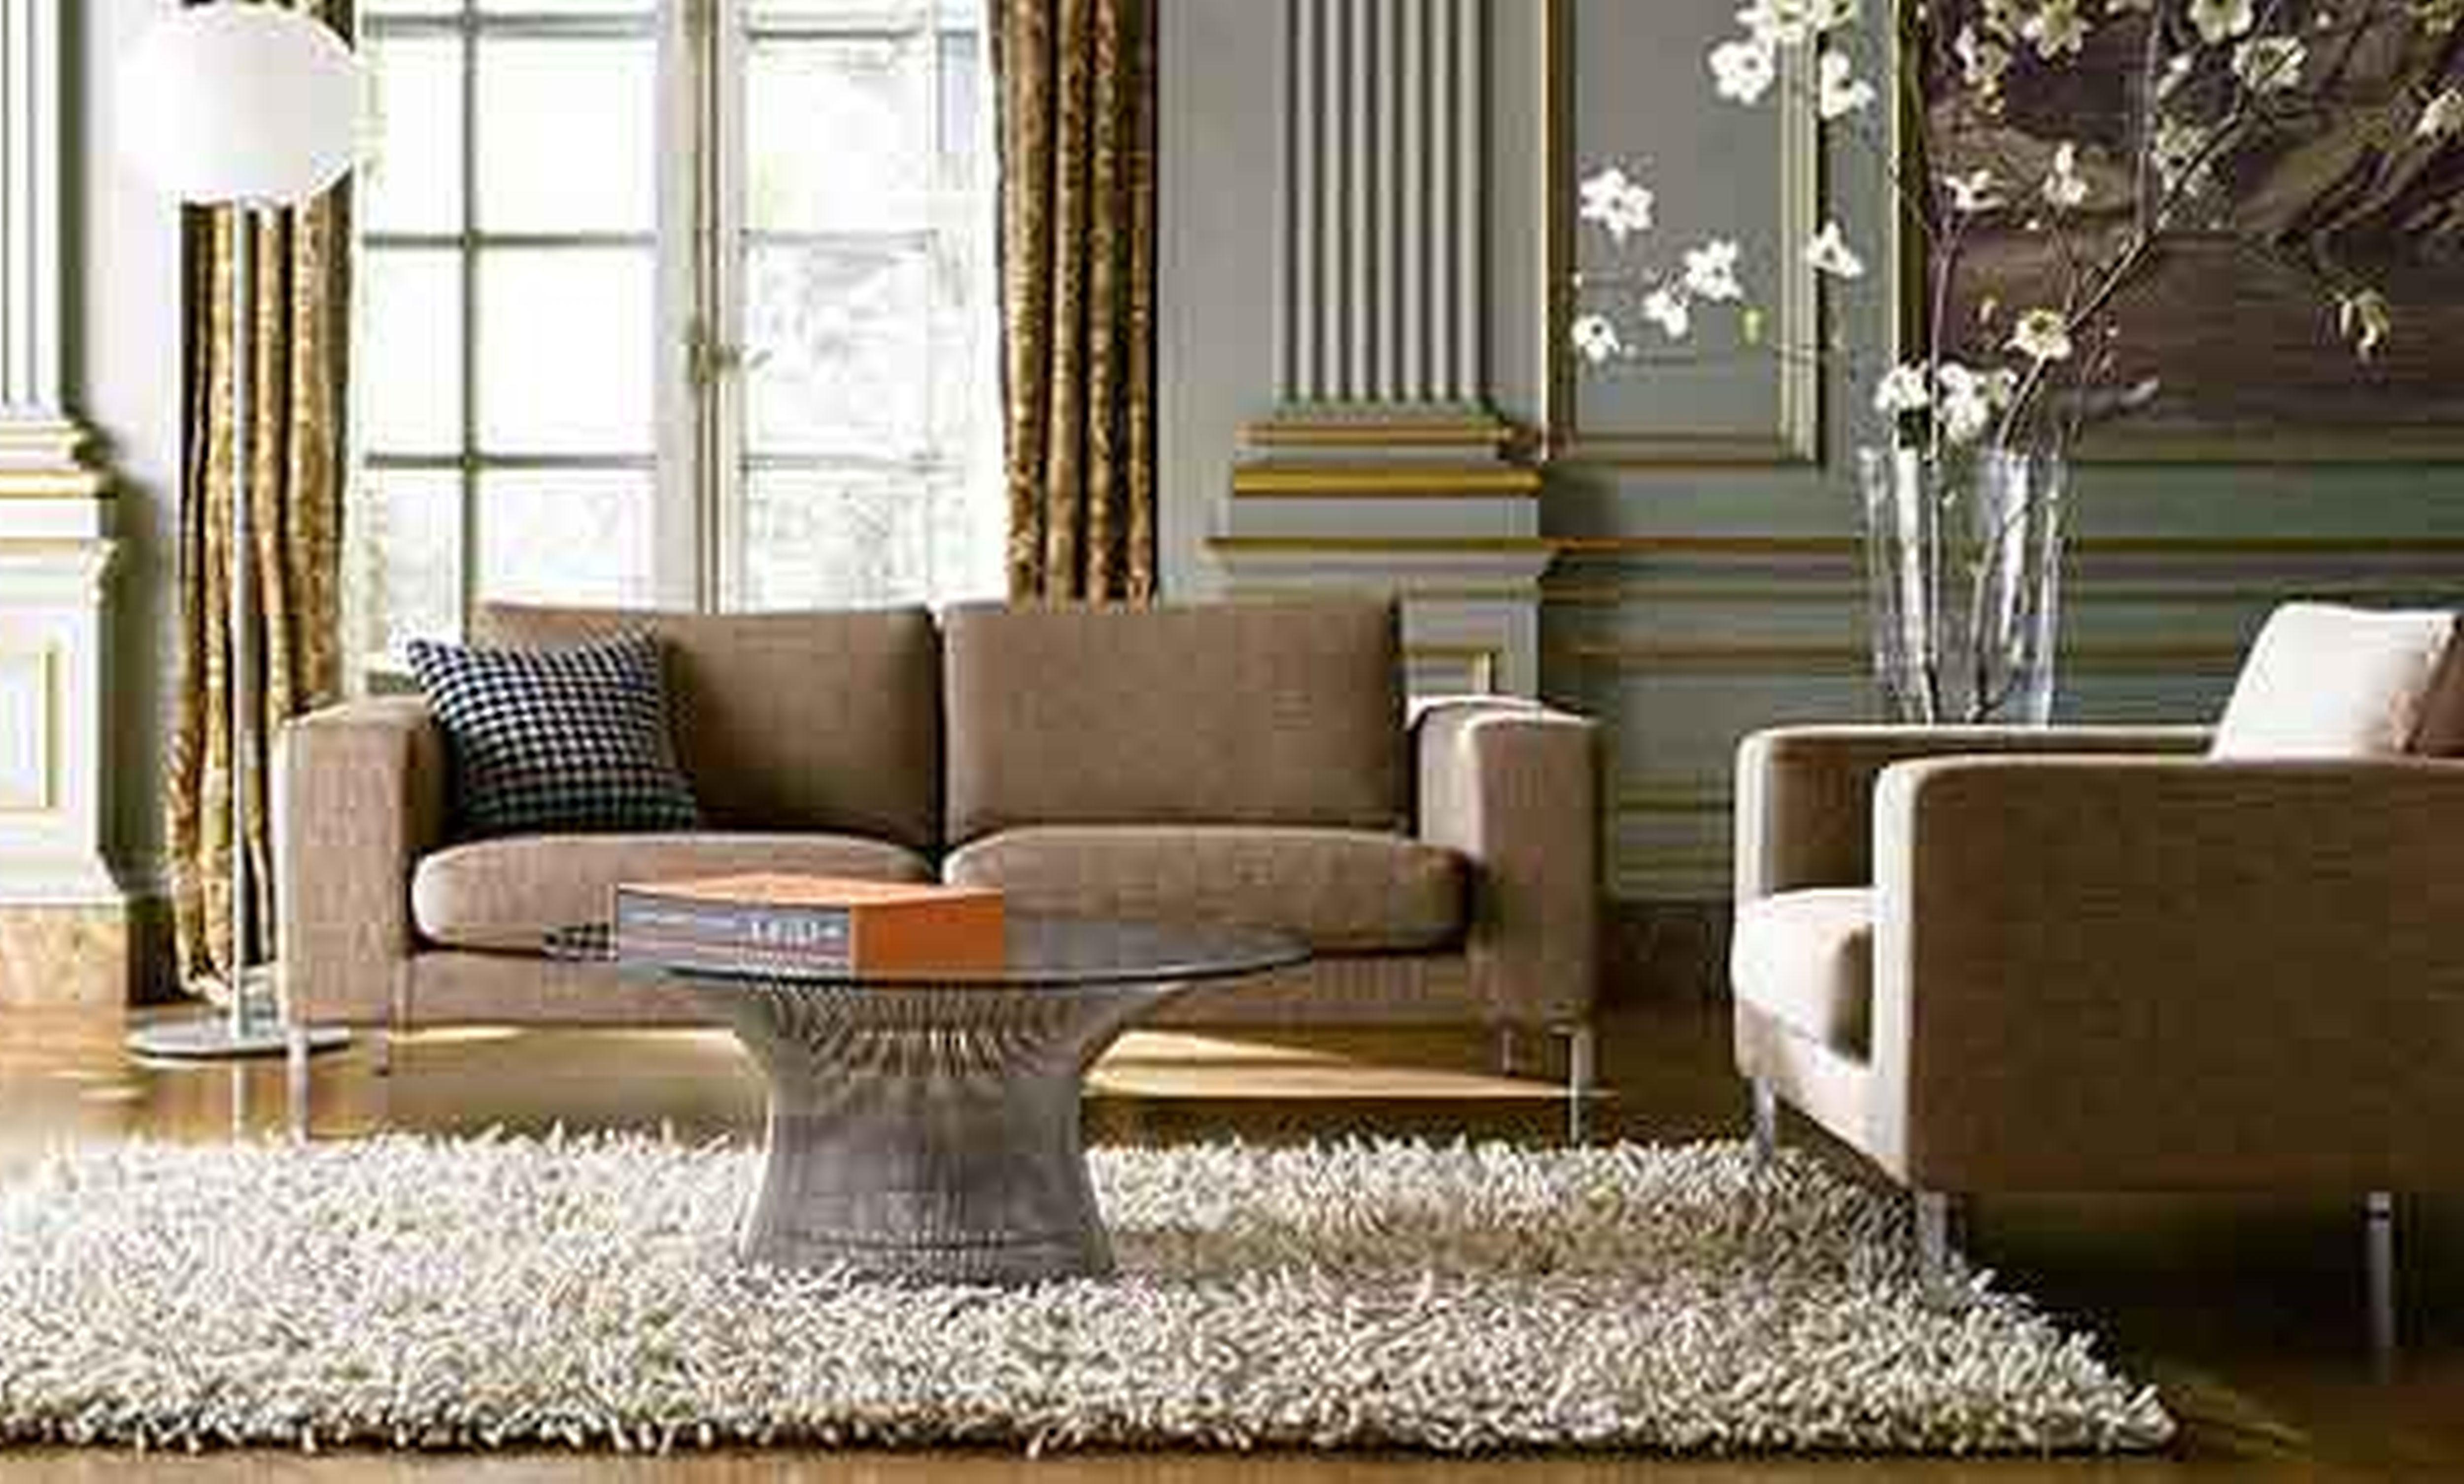 Small living room furniture arrangement ideas Chair